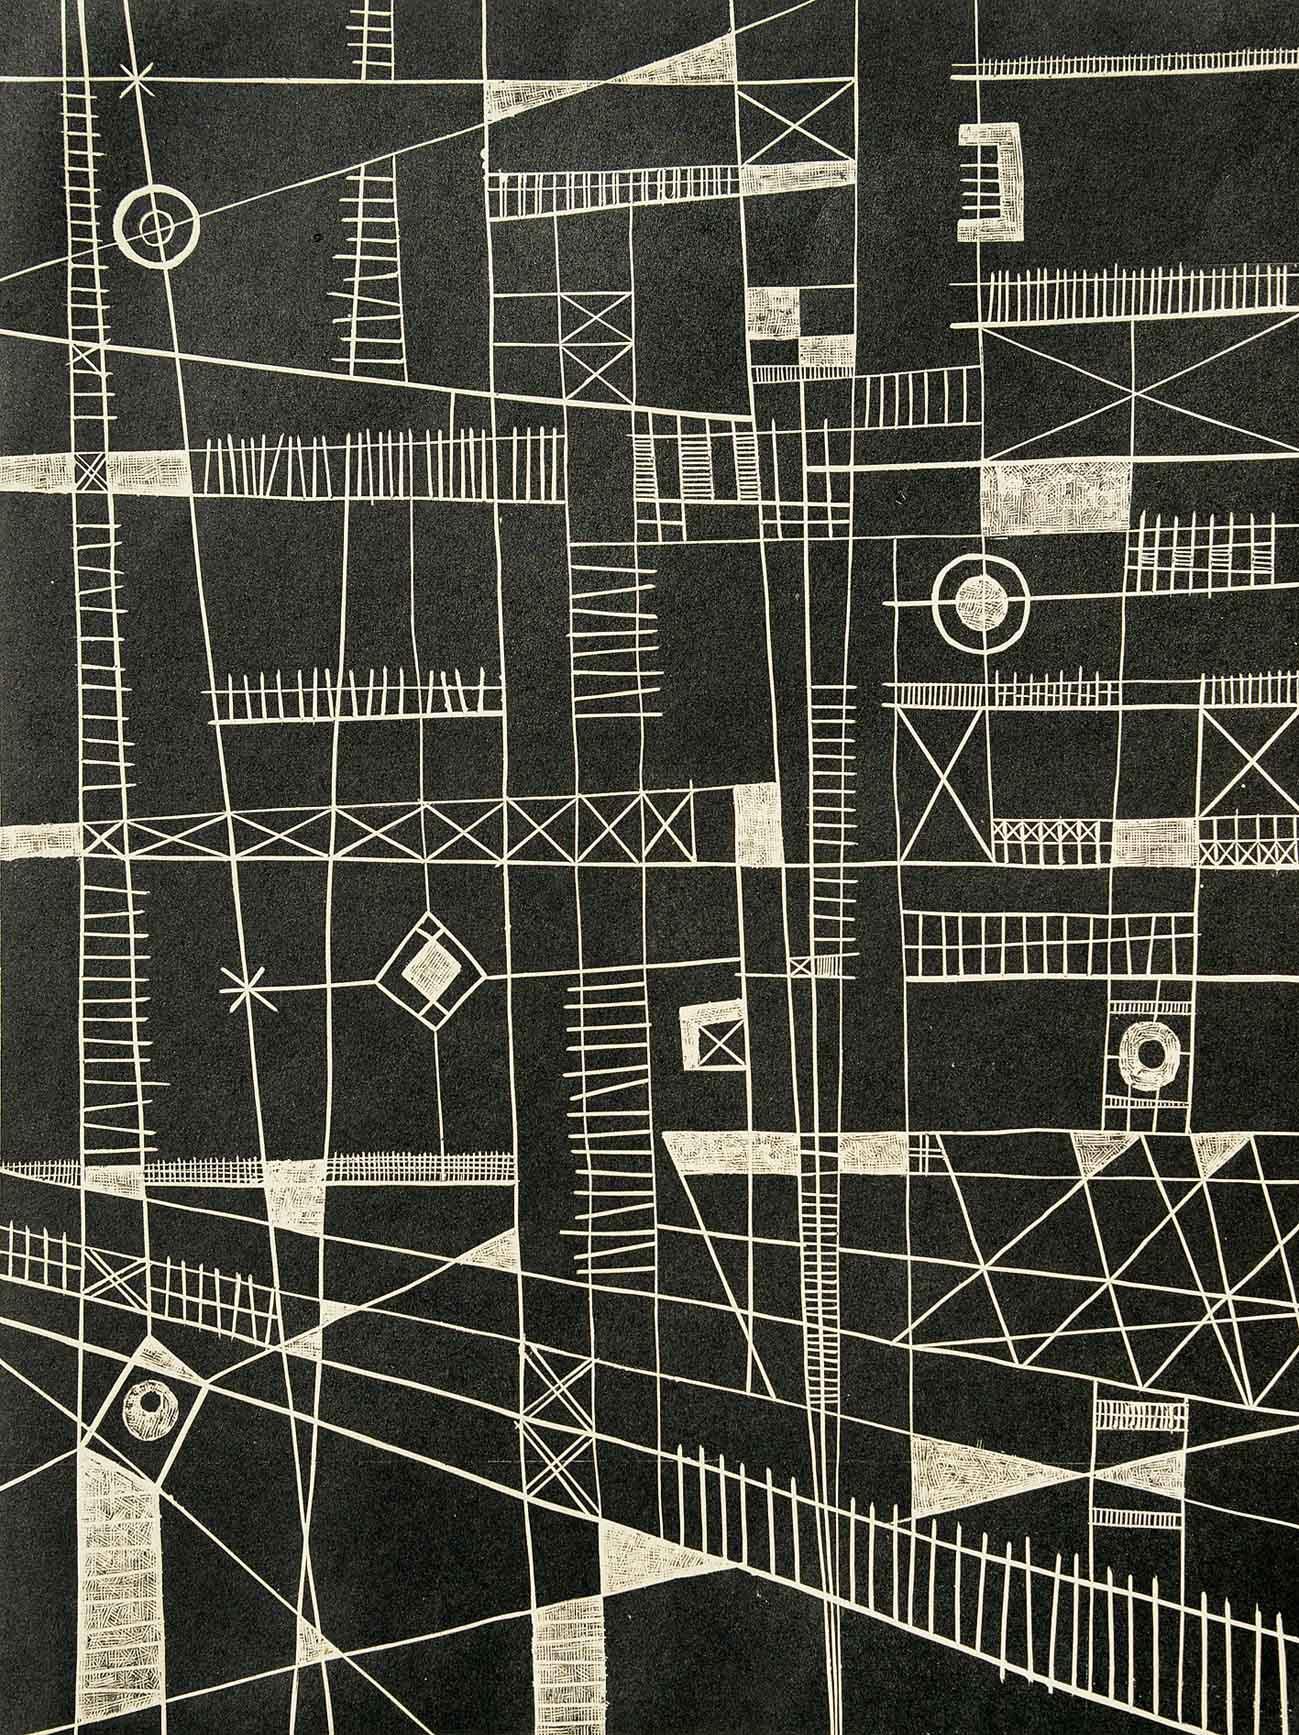 7-fabbrica-macchine-1953-xilogr